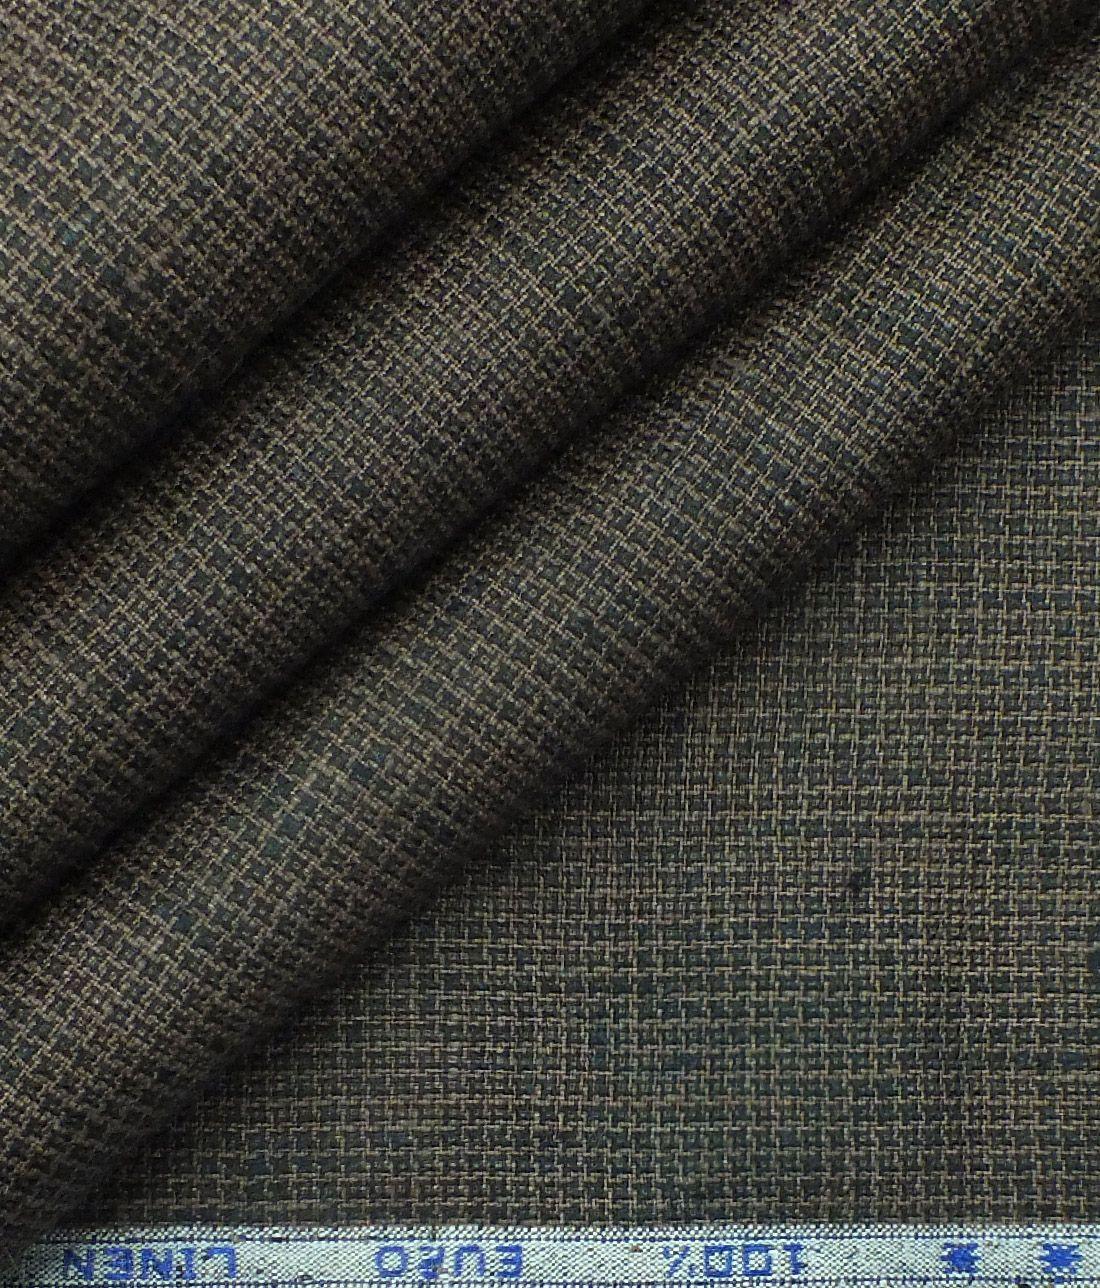 Solino Dark Brown 100 Euro Linen Houndstooth Weave Trouser Fabric 1 30 M Linen Houndstooth Fabric